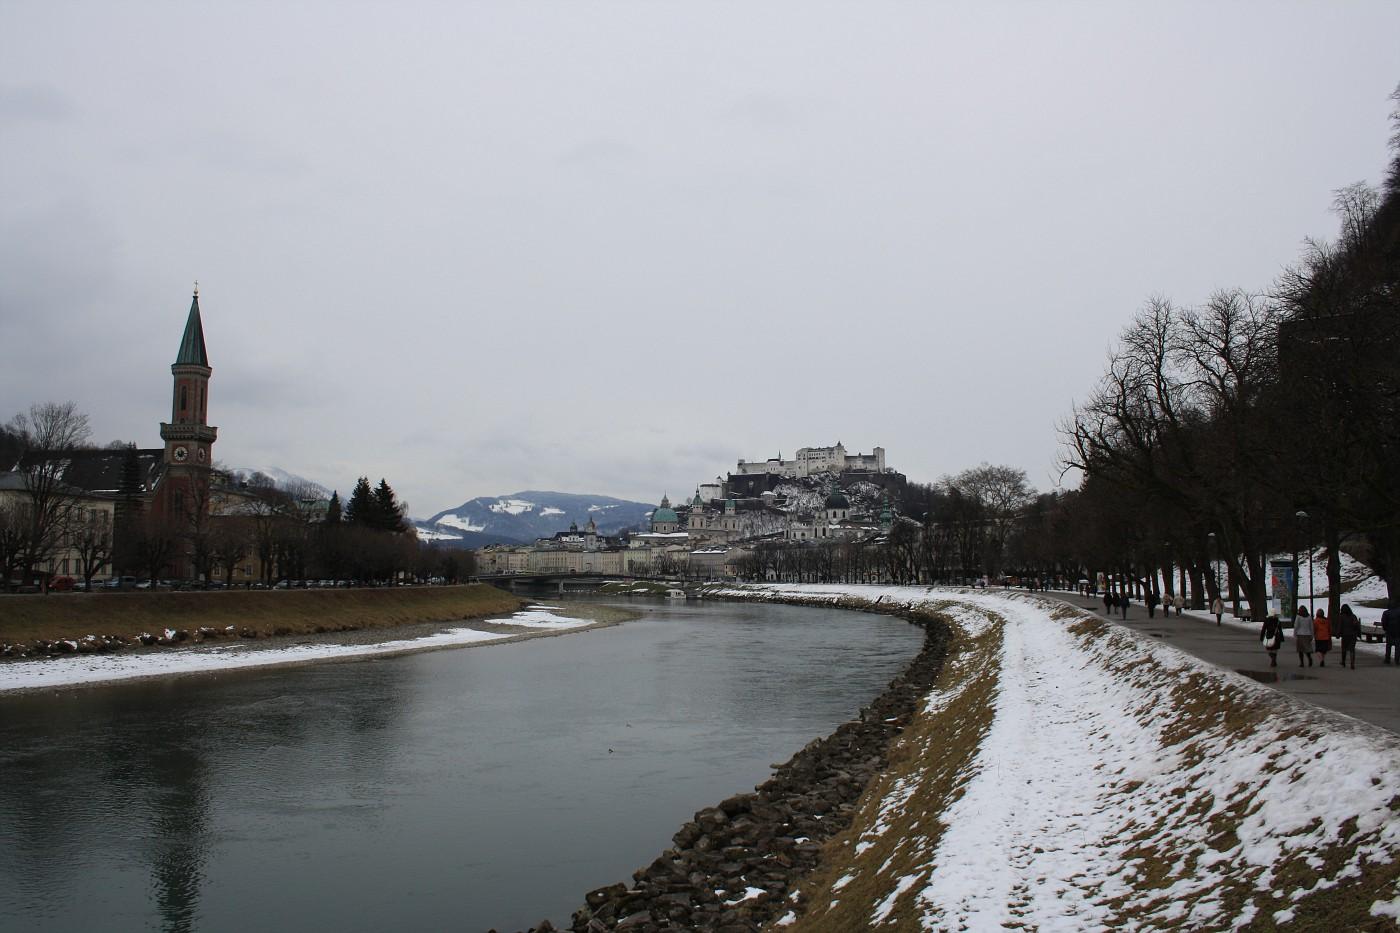 http://images19.fotki.com/v286/photos/2/243162/8488810/Salzburg1-vi.jpg